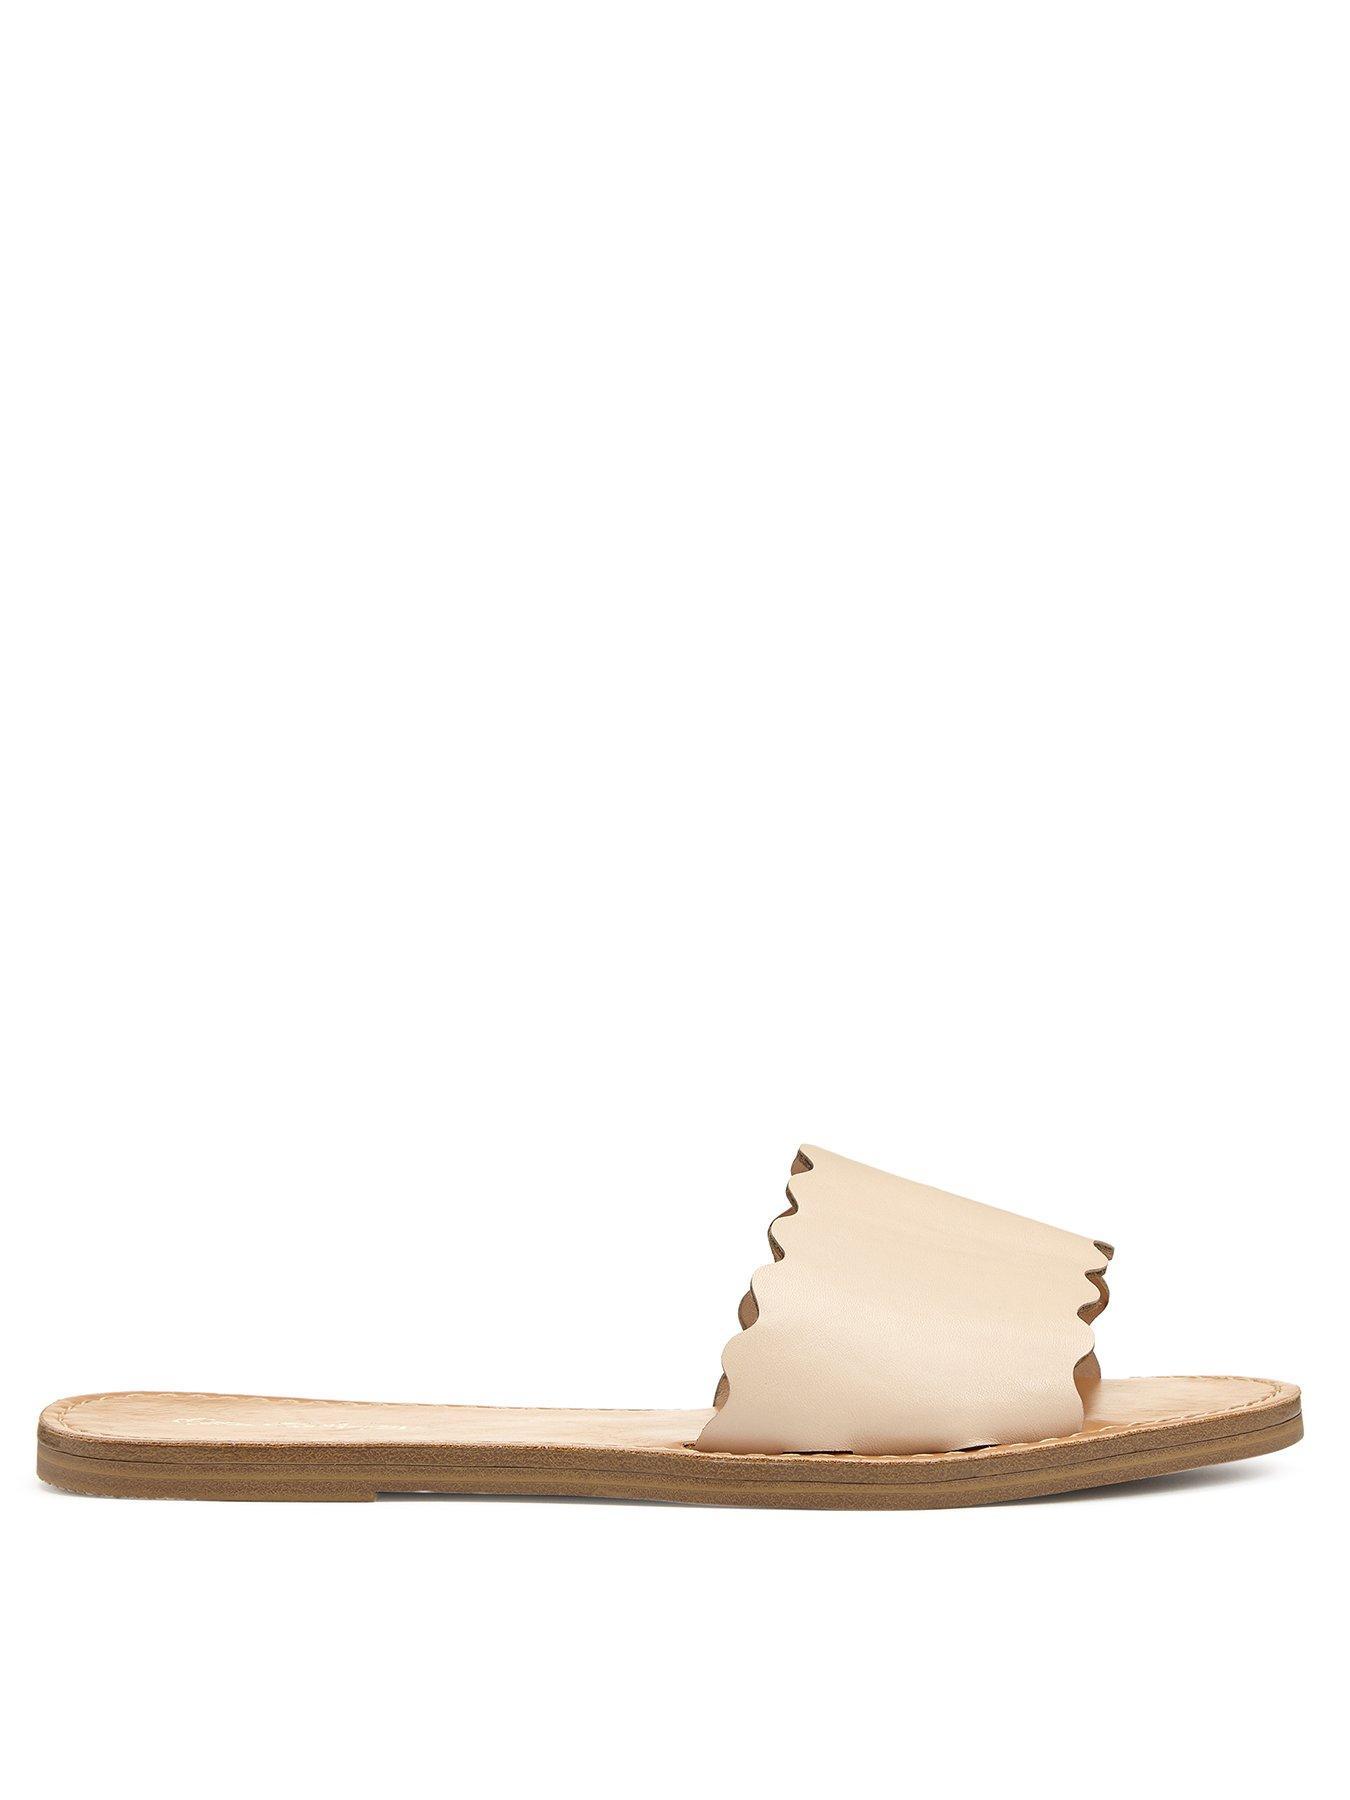 Miss Selfridge Scallop Slide Flat Sandal